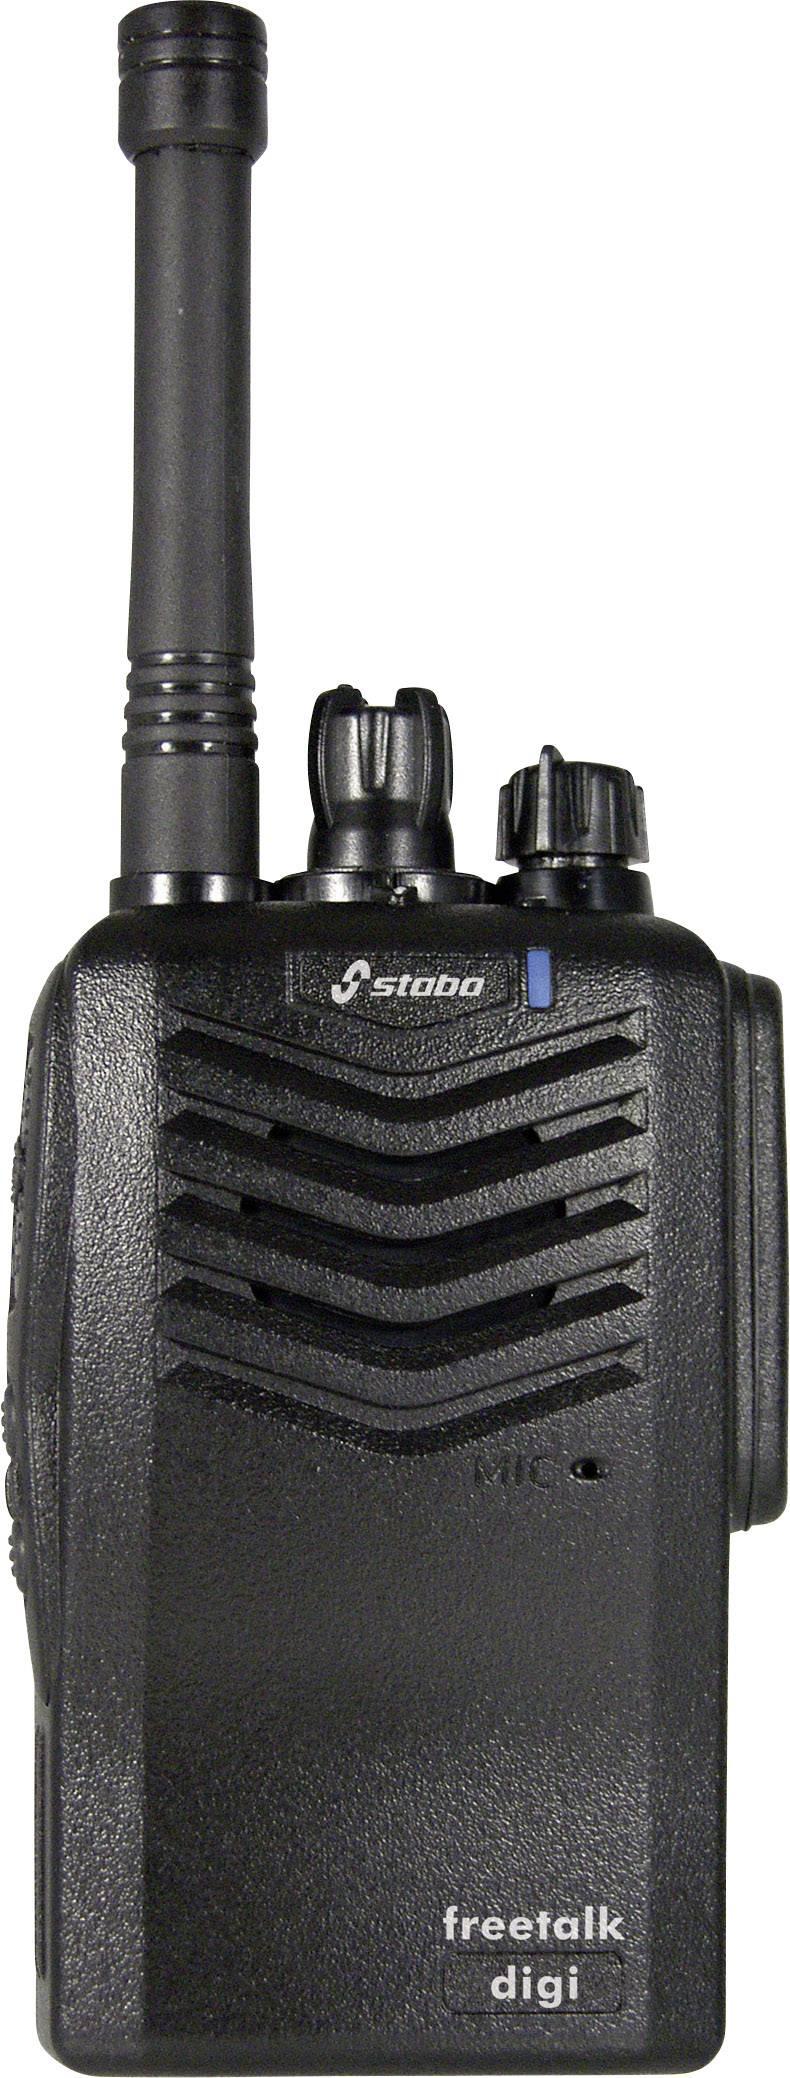 PMR radiostanice Stabo freetalk Digi 20280